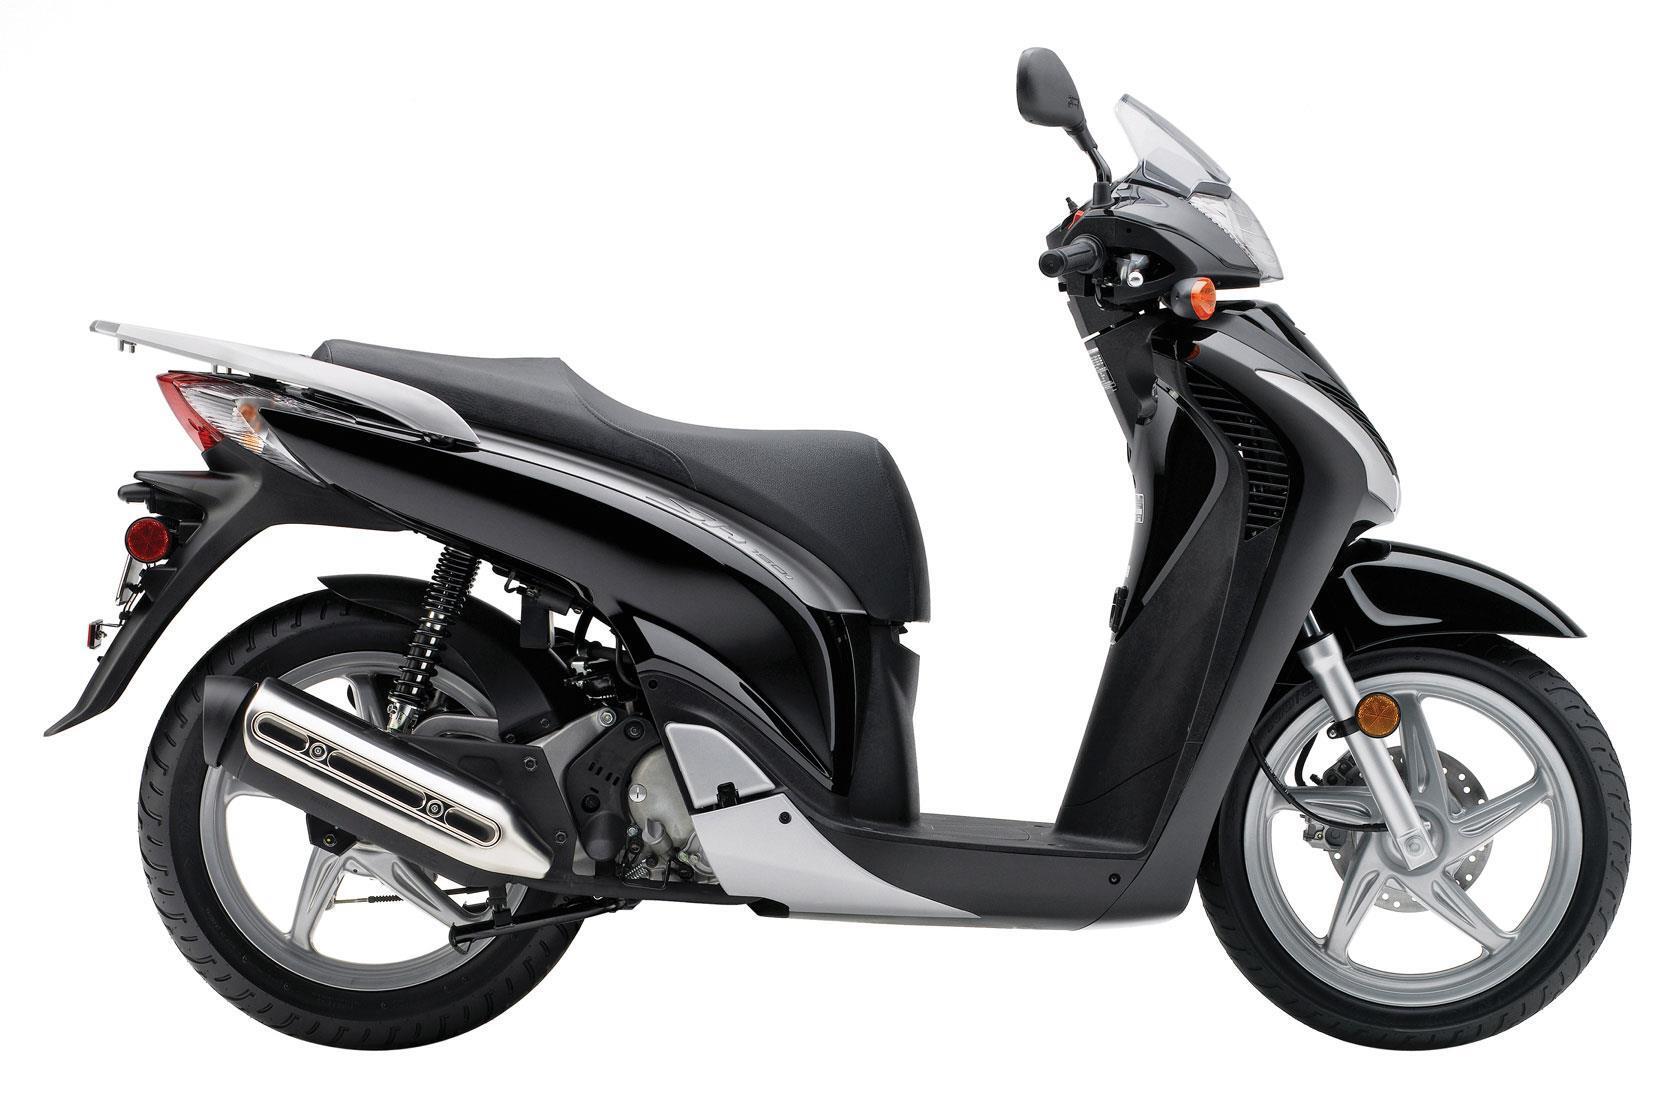 giá xe máy Honda SH 150